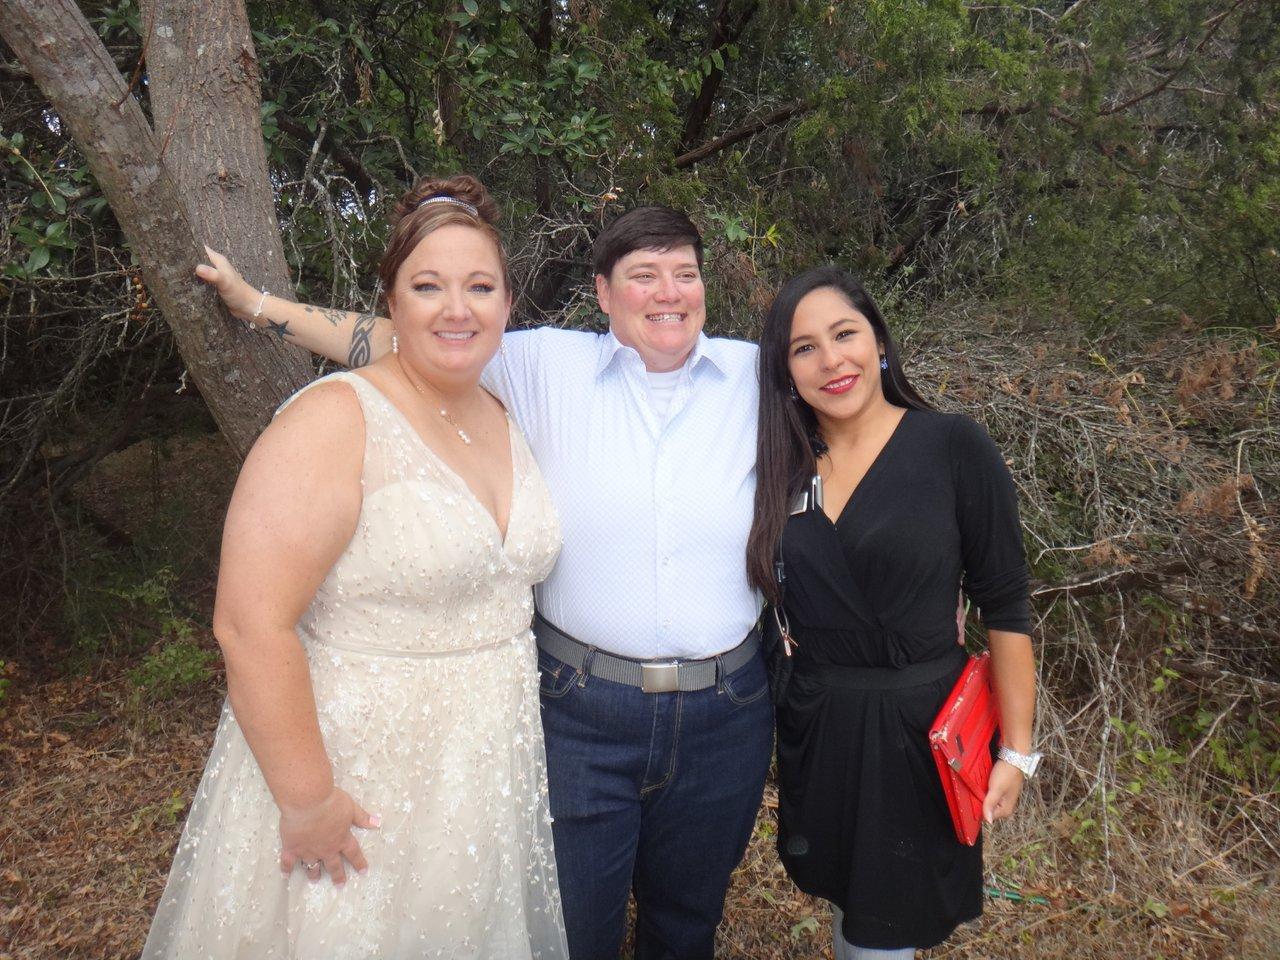 Wedding photo DSC06265 (1).jpg